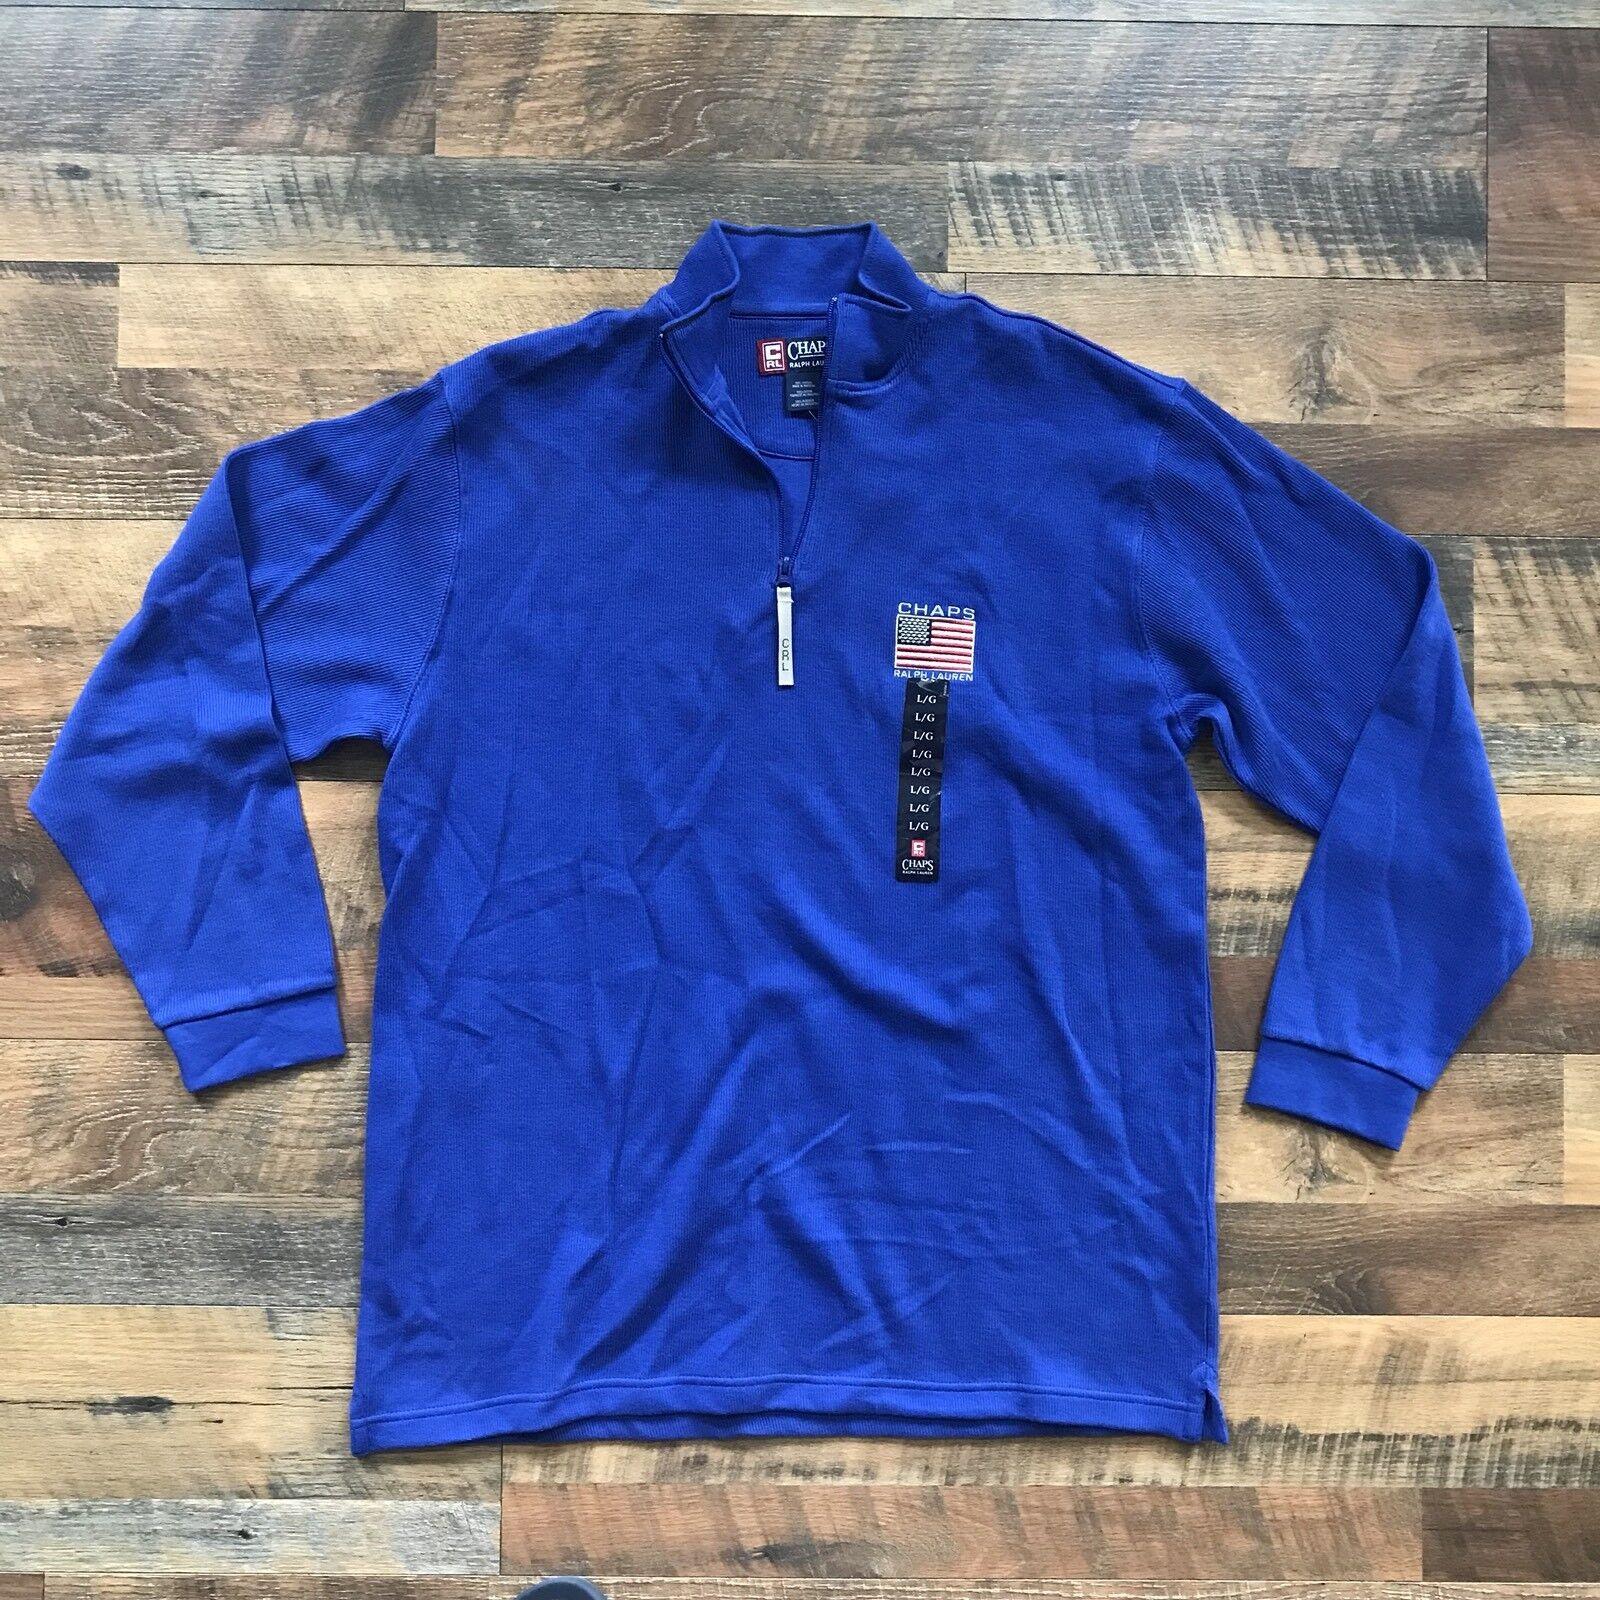 Neue Retro Chaps Ralph Lauren 1 4 Reißverschluss Sweatshirt Big USA Flagge Logo